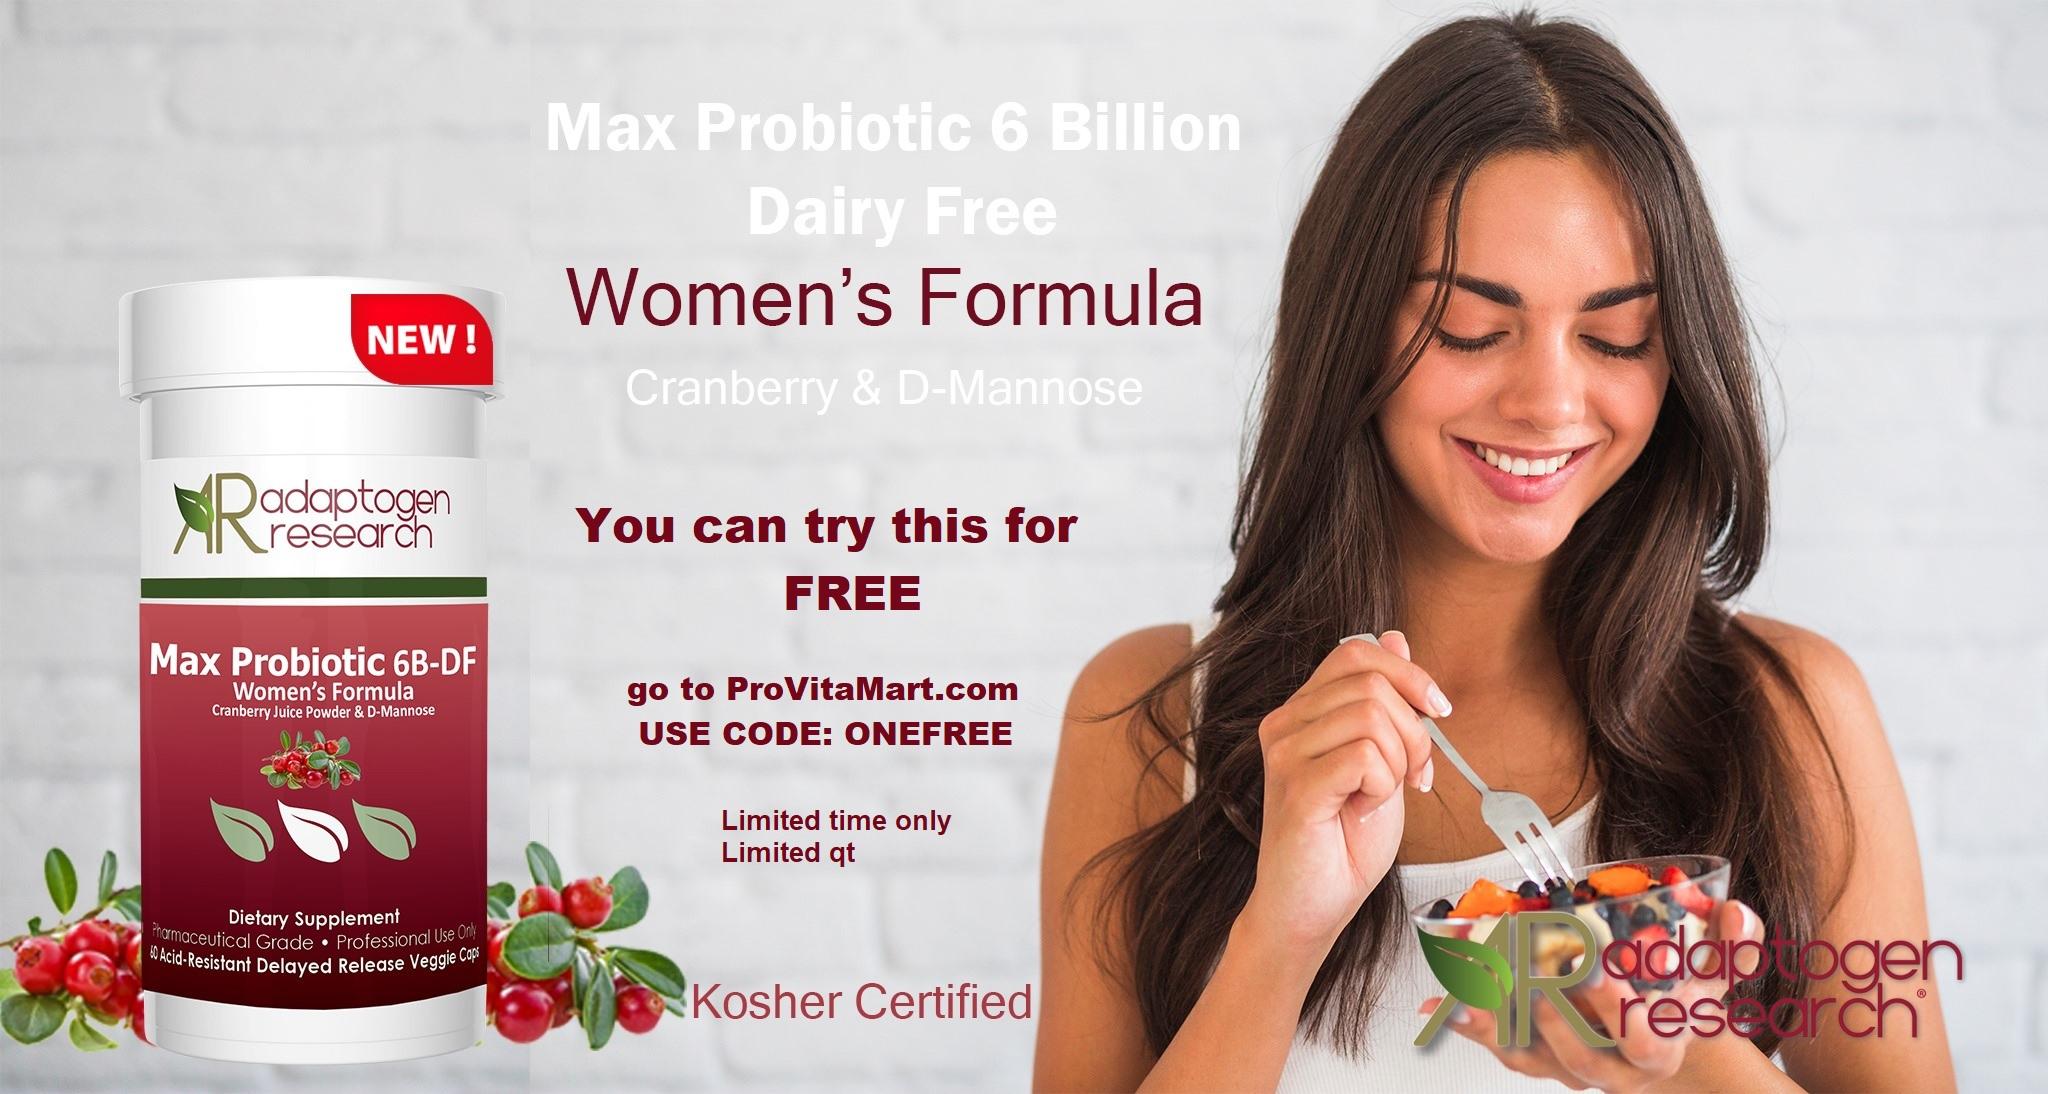 THER-BIOTIC® WOMEN'S FORMULA